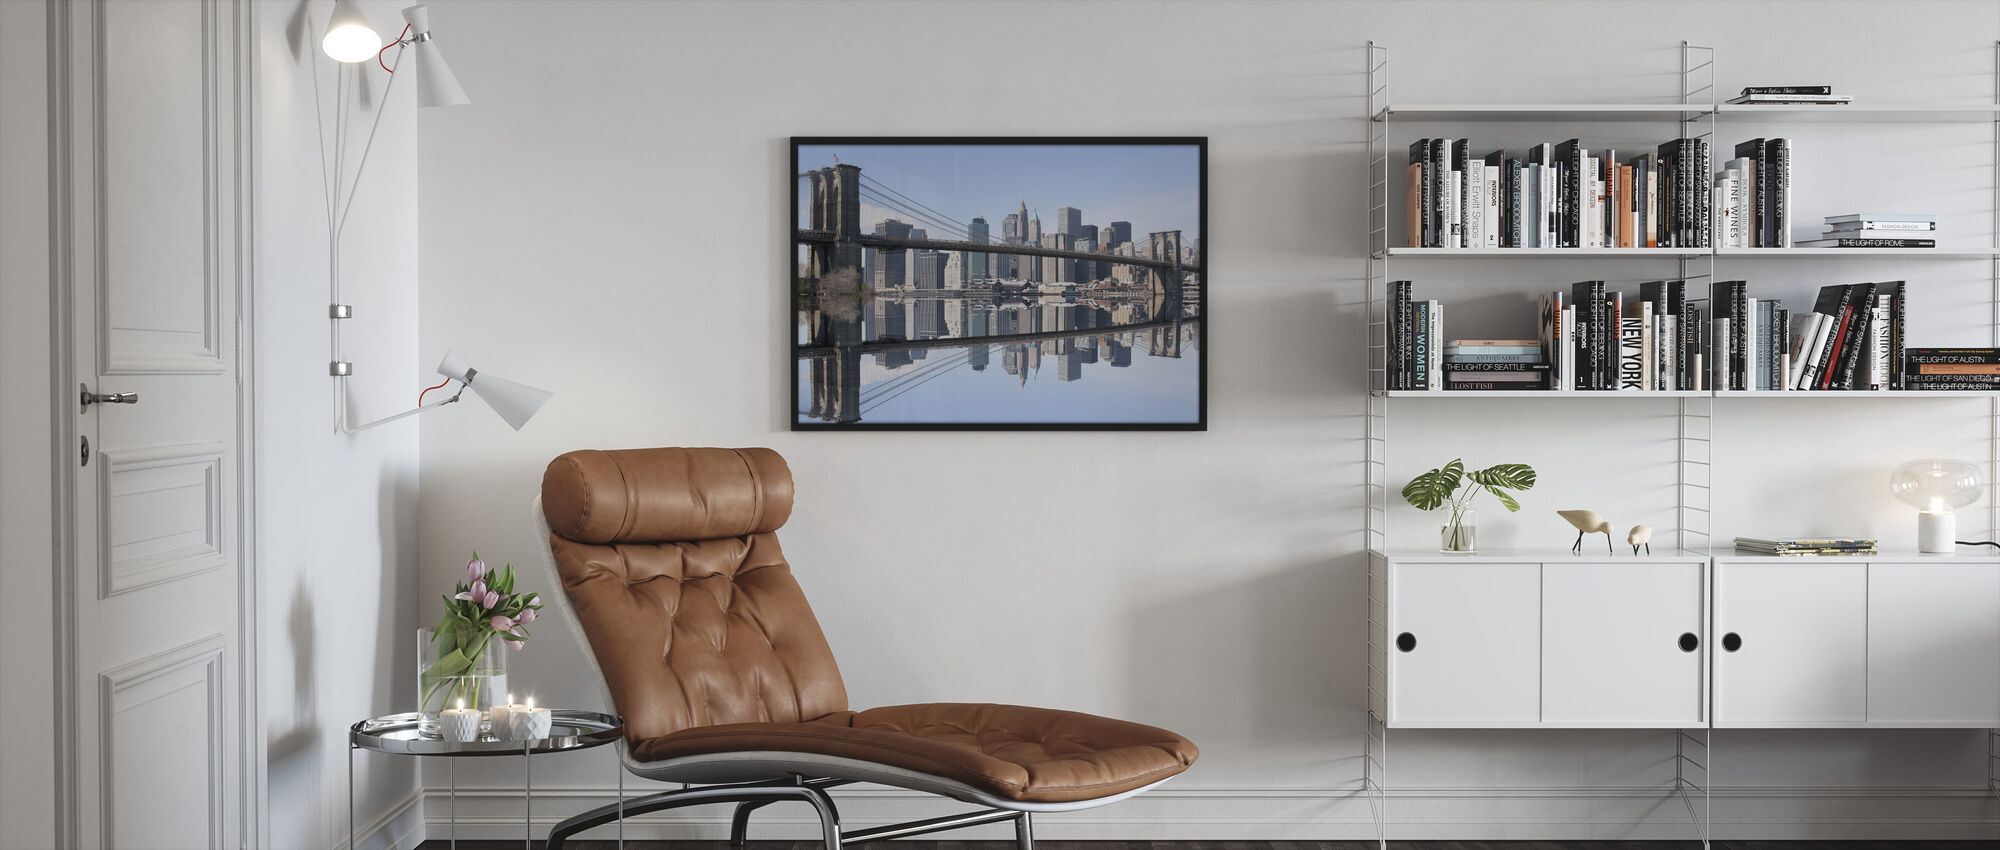 Brooklyn Bridge Clear Blue Day - Framed print - Living Room